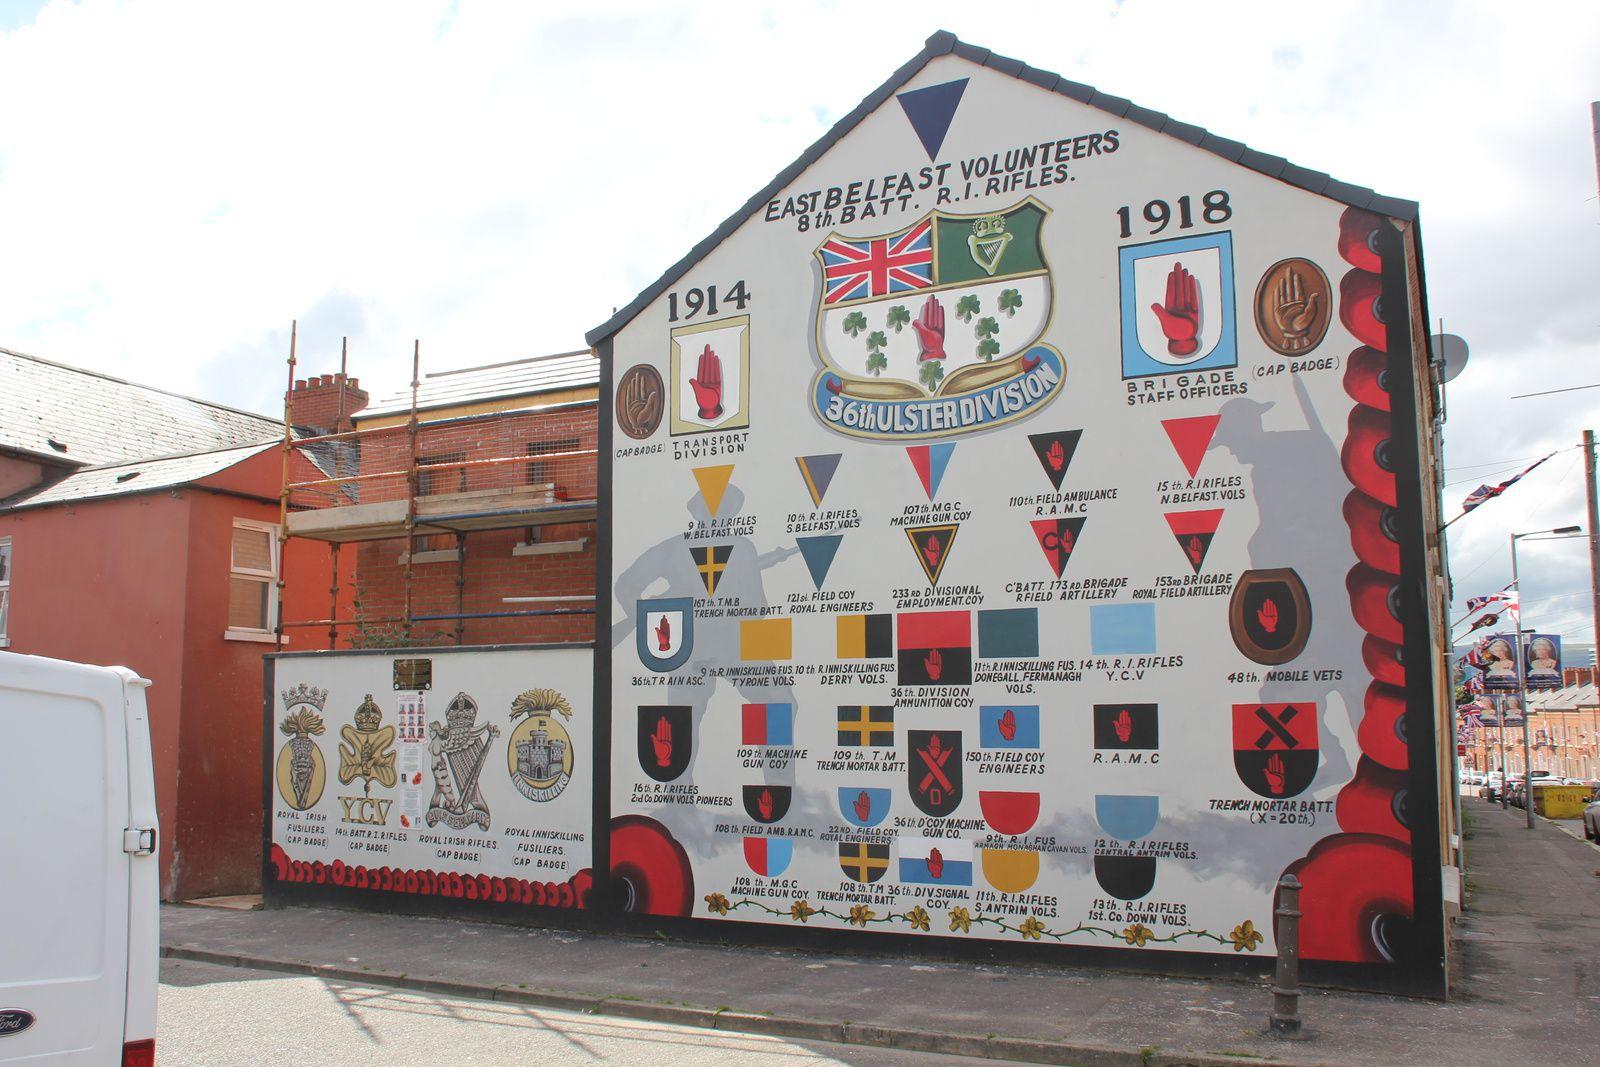 684) Willowfield Street, South Belfast